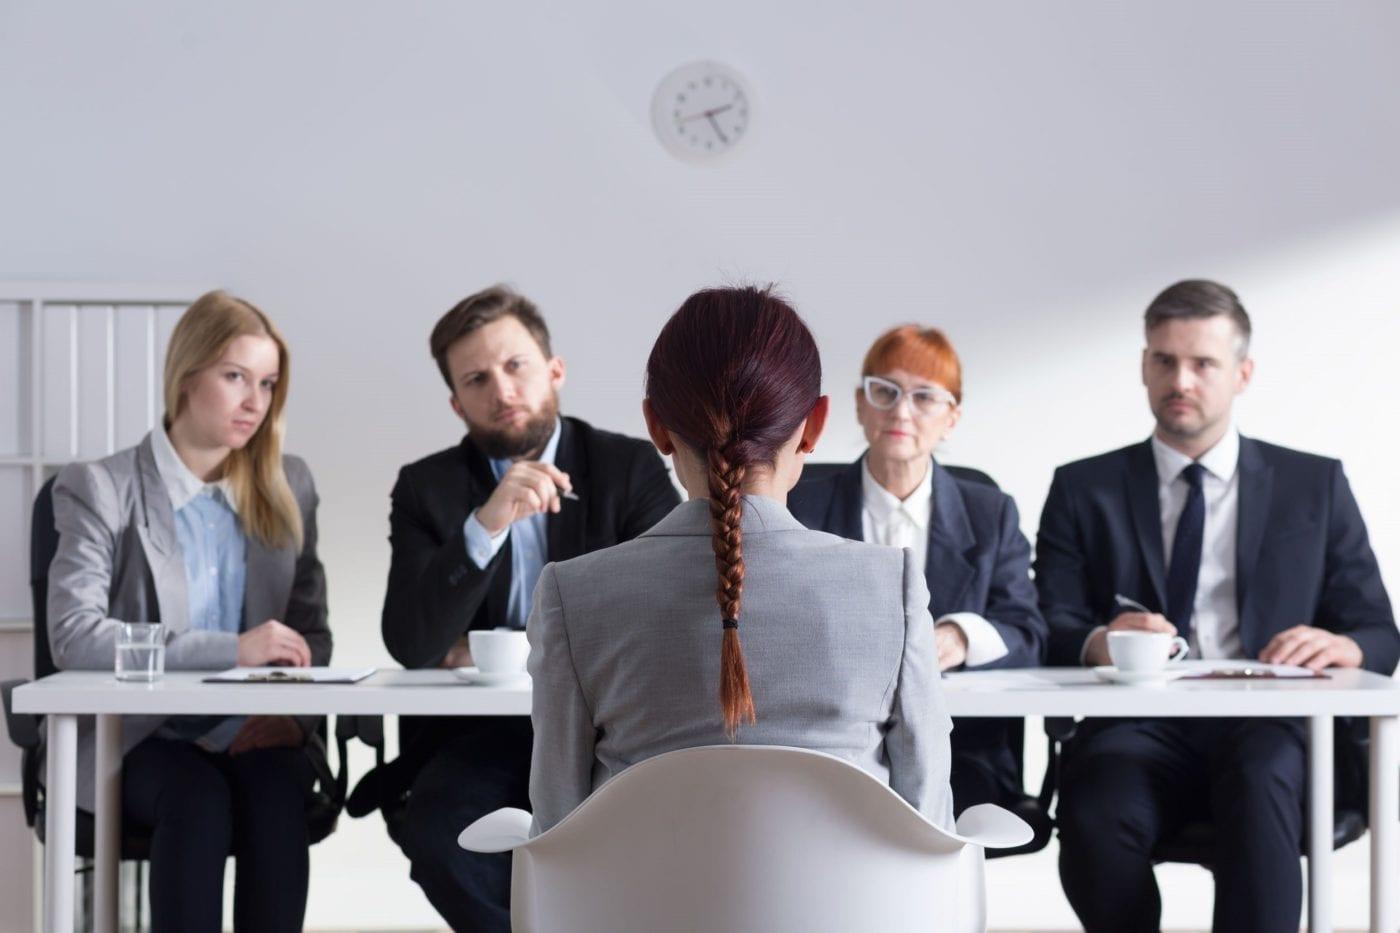 Helen Tupper: Three questions you shouldn't ask in job interviews